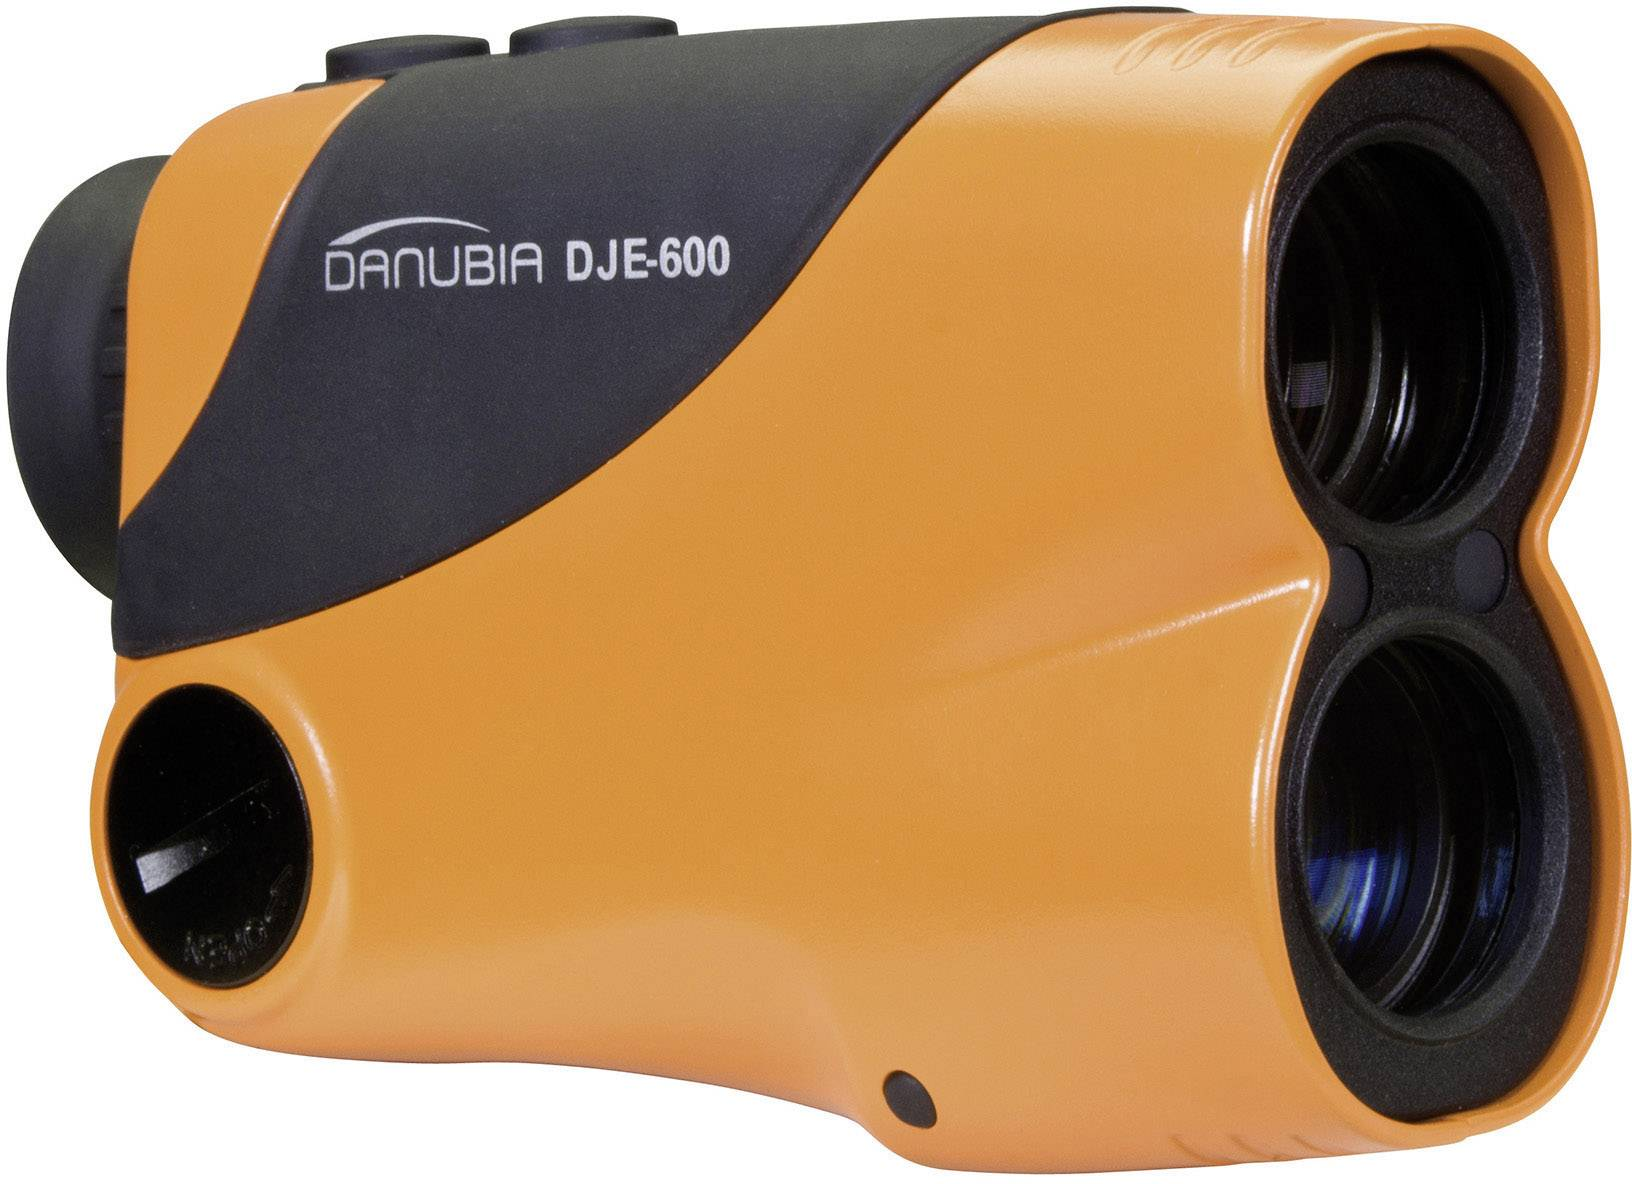 Gps Entfernungsmesser Nikon : Entfernungsmesser nikon aculon al mm reichweite bis